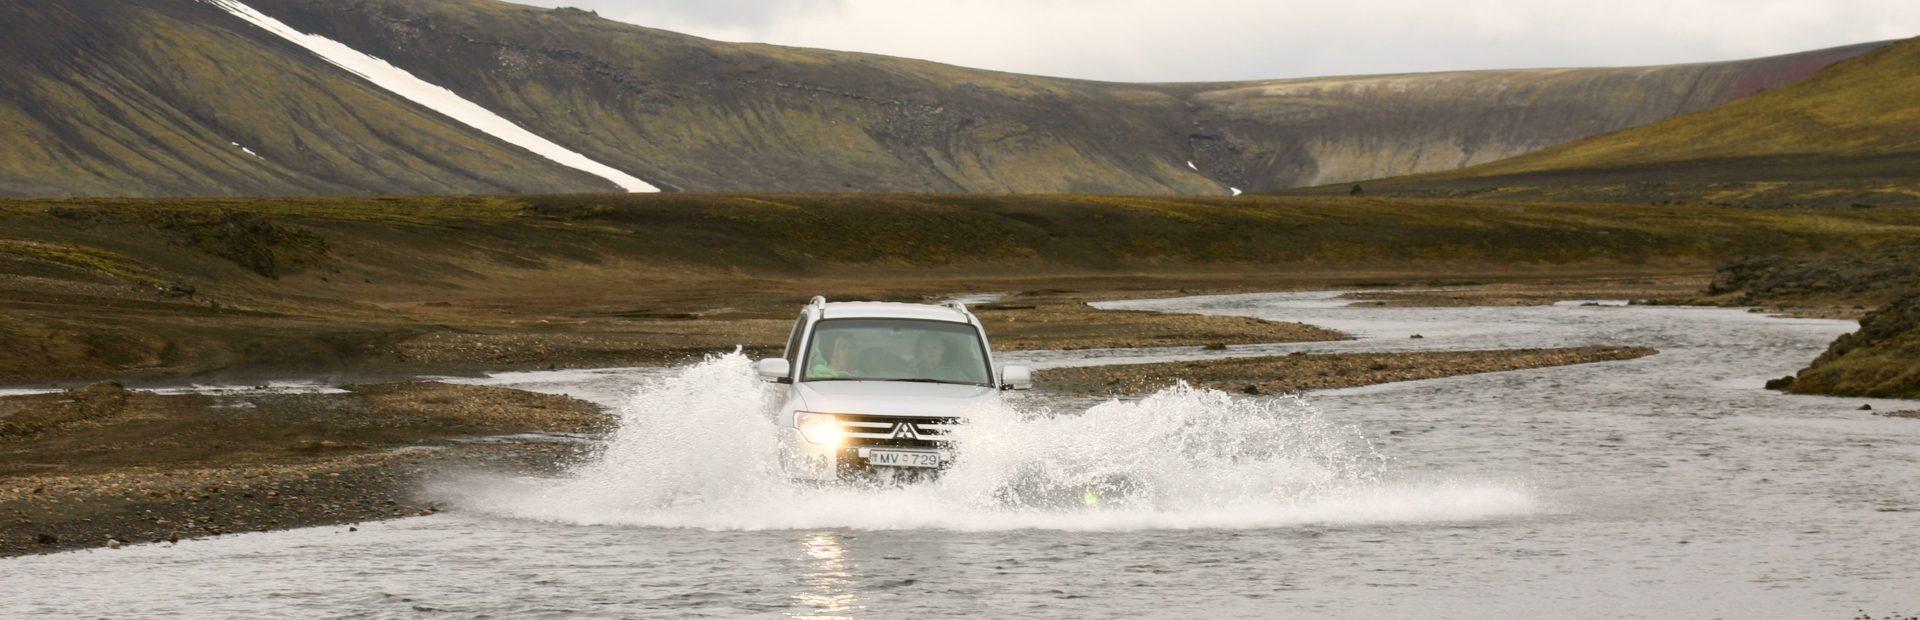 vervoer-ijsland